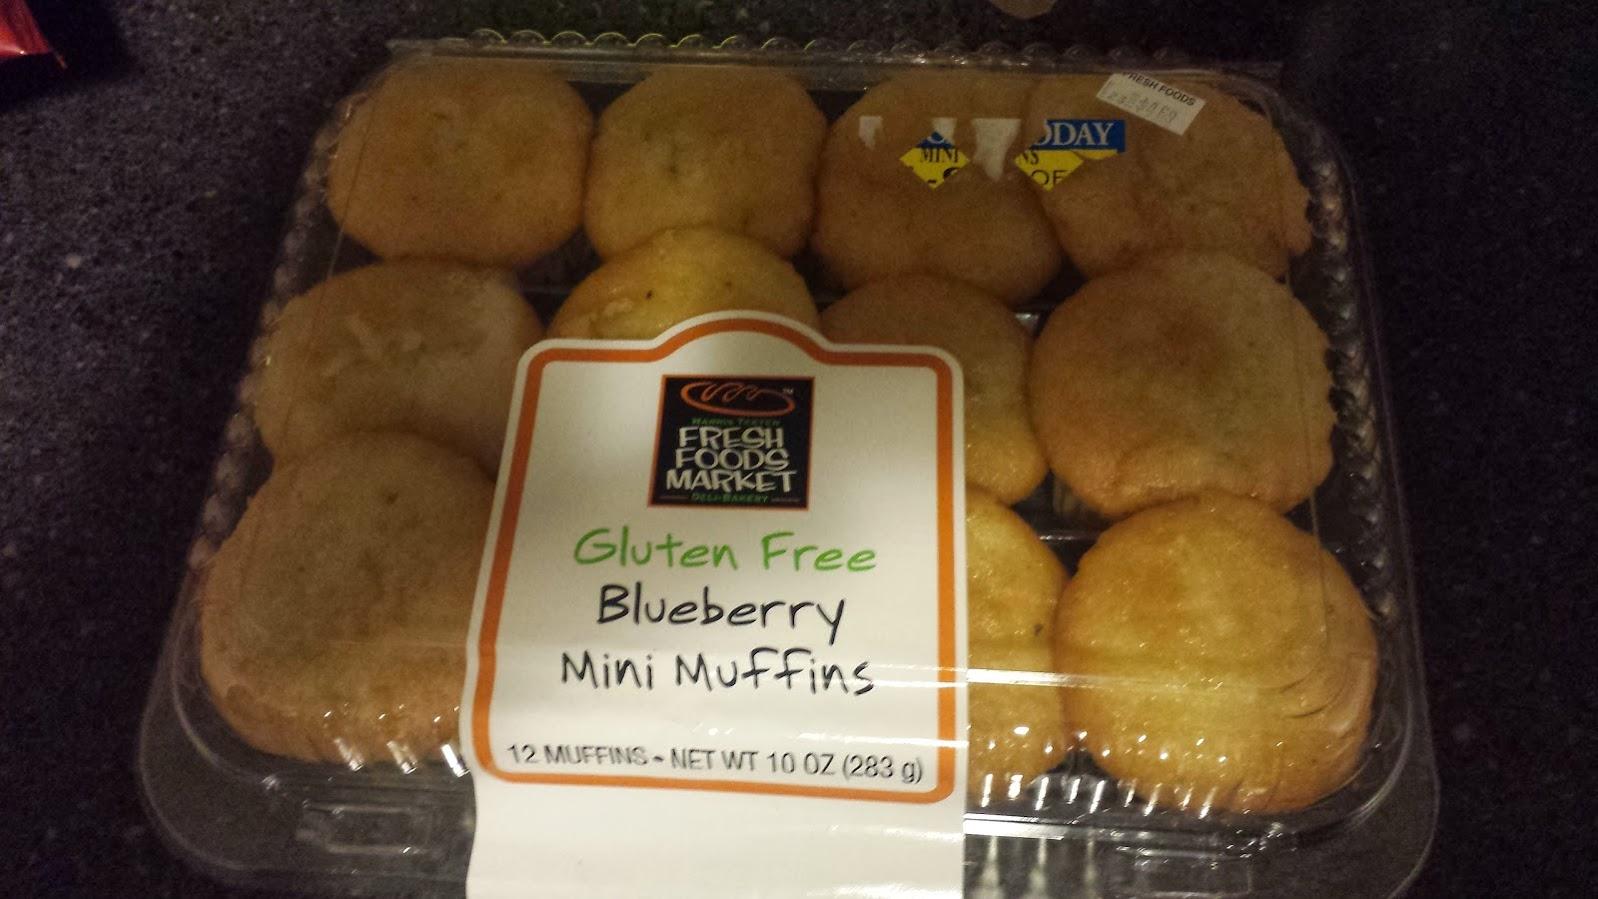 Harris Teeter Muffins